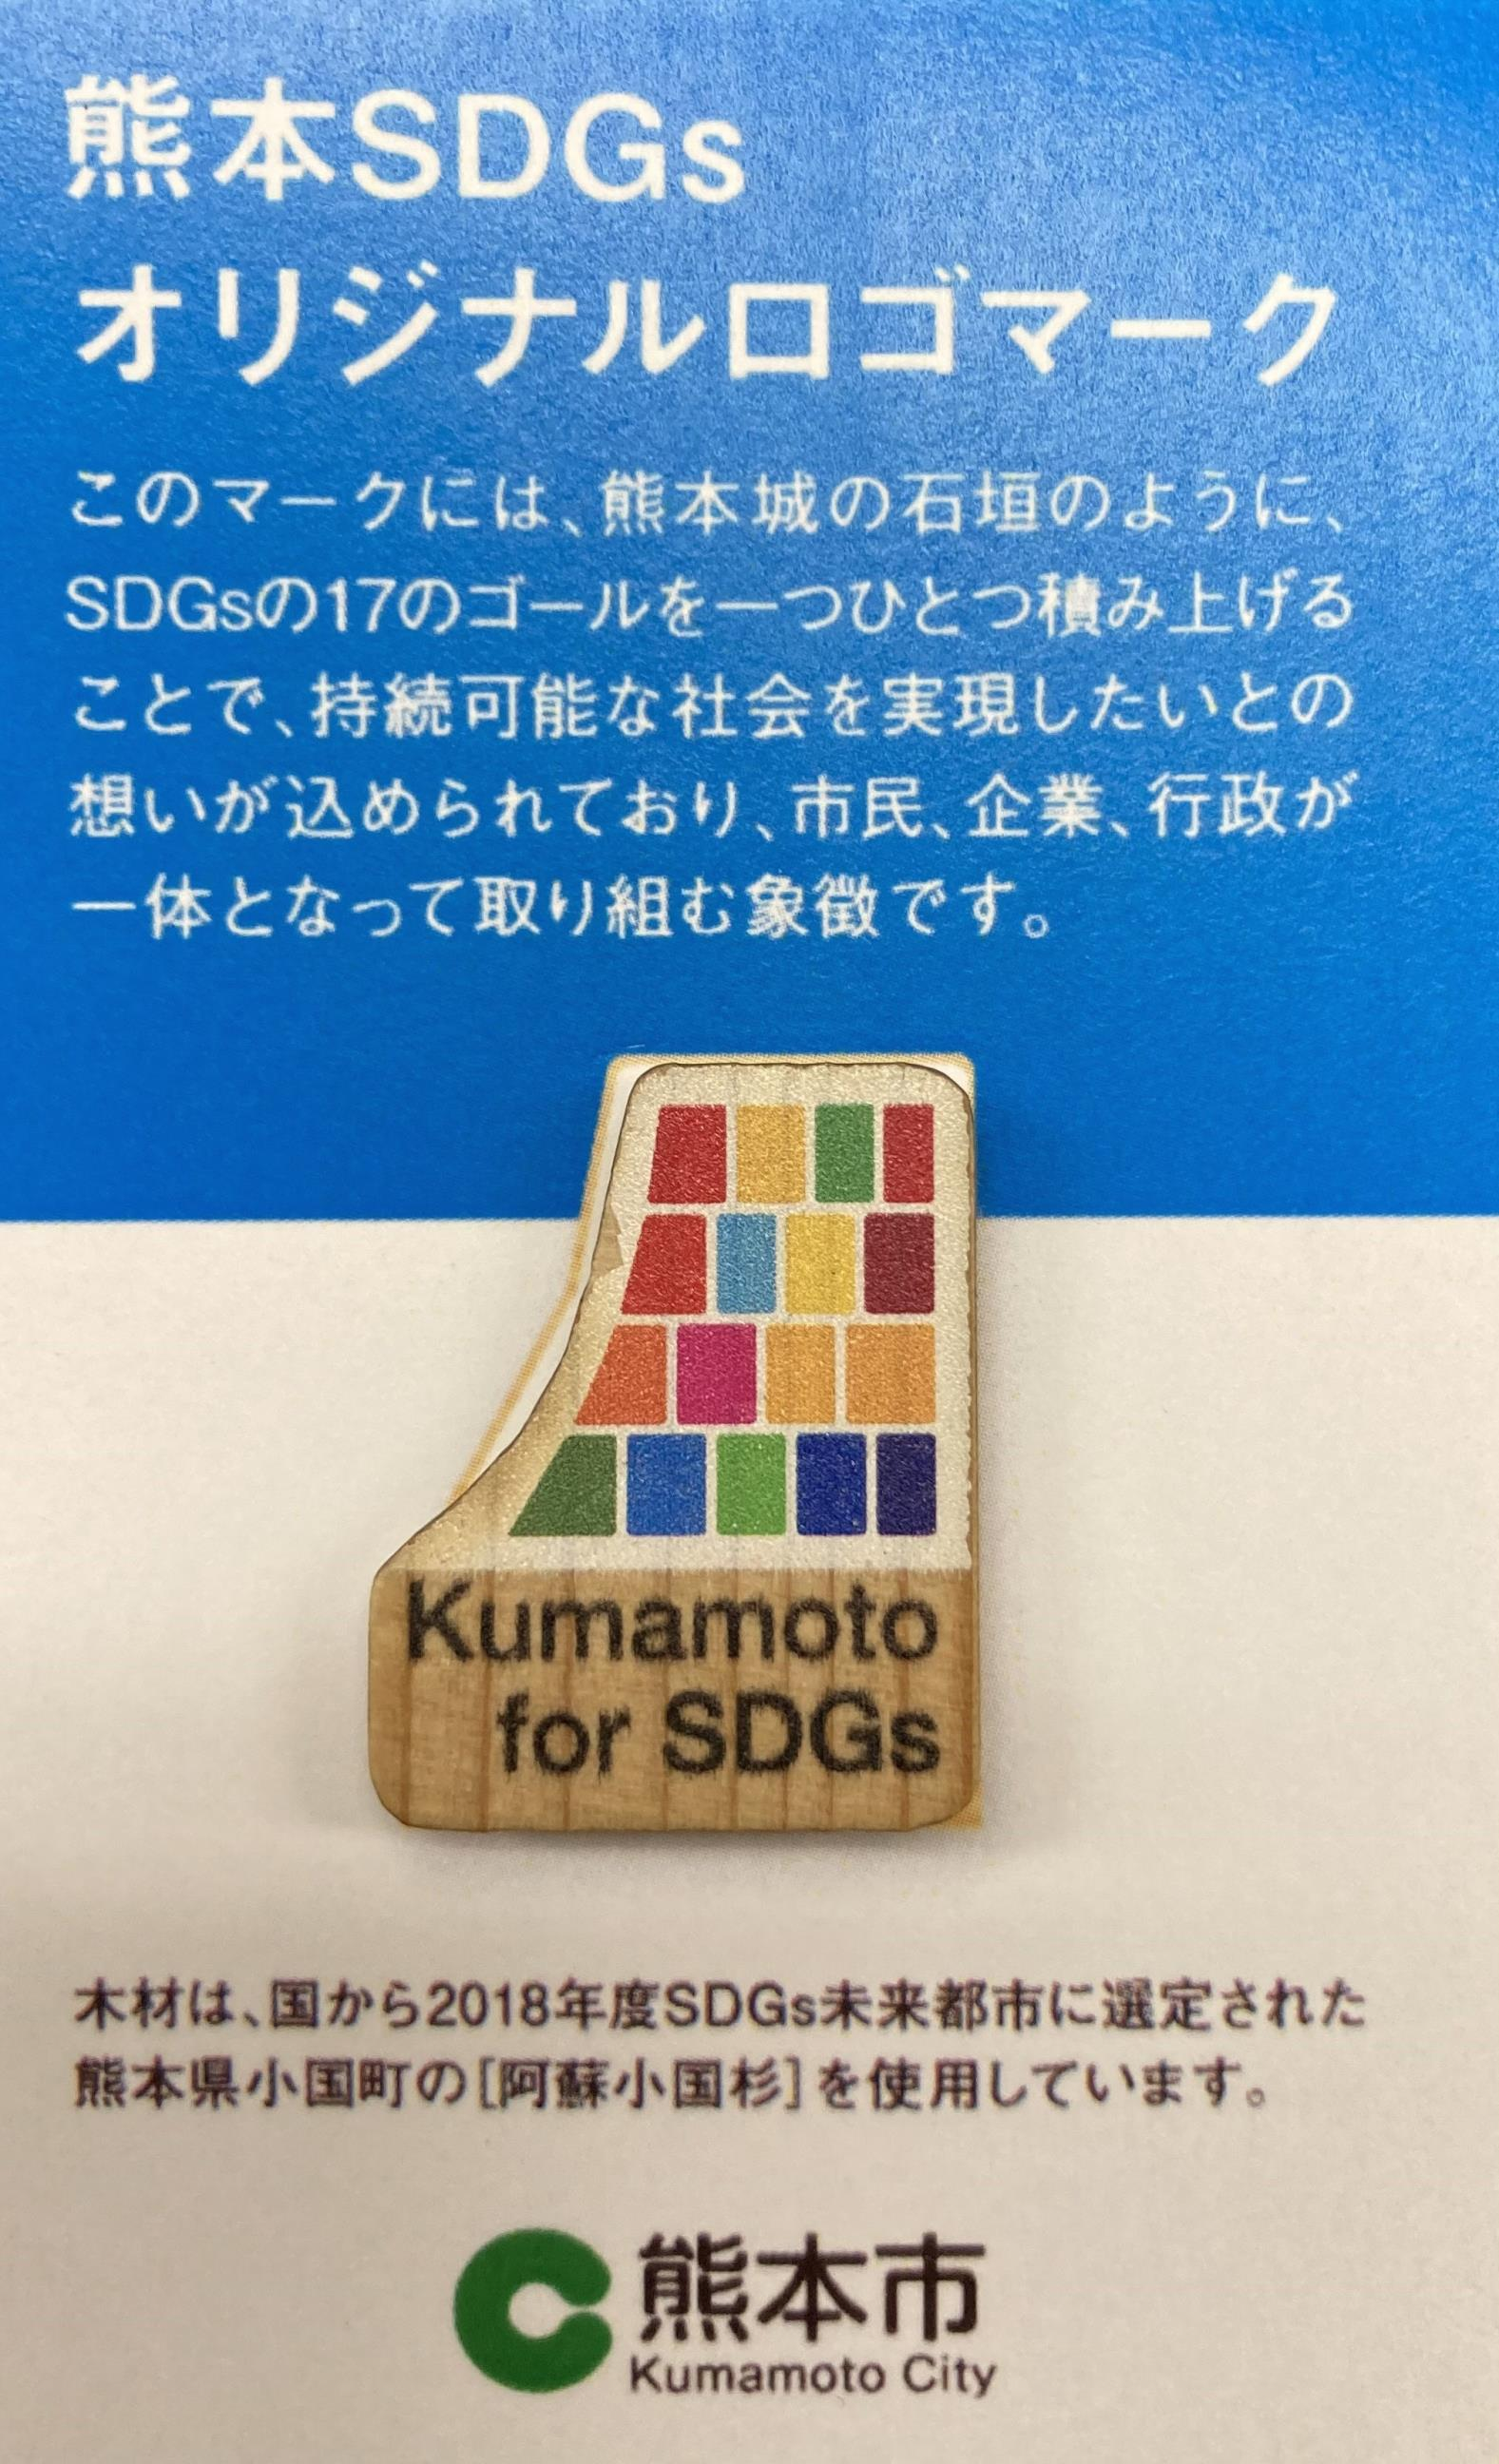 Kumamoto for SDGsロゴマークのバッジ